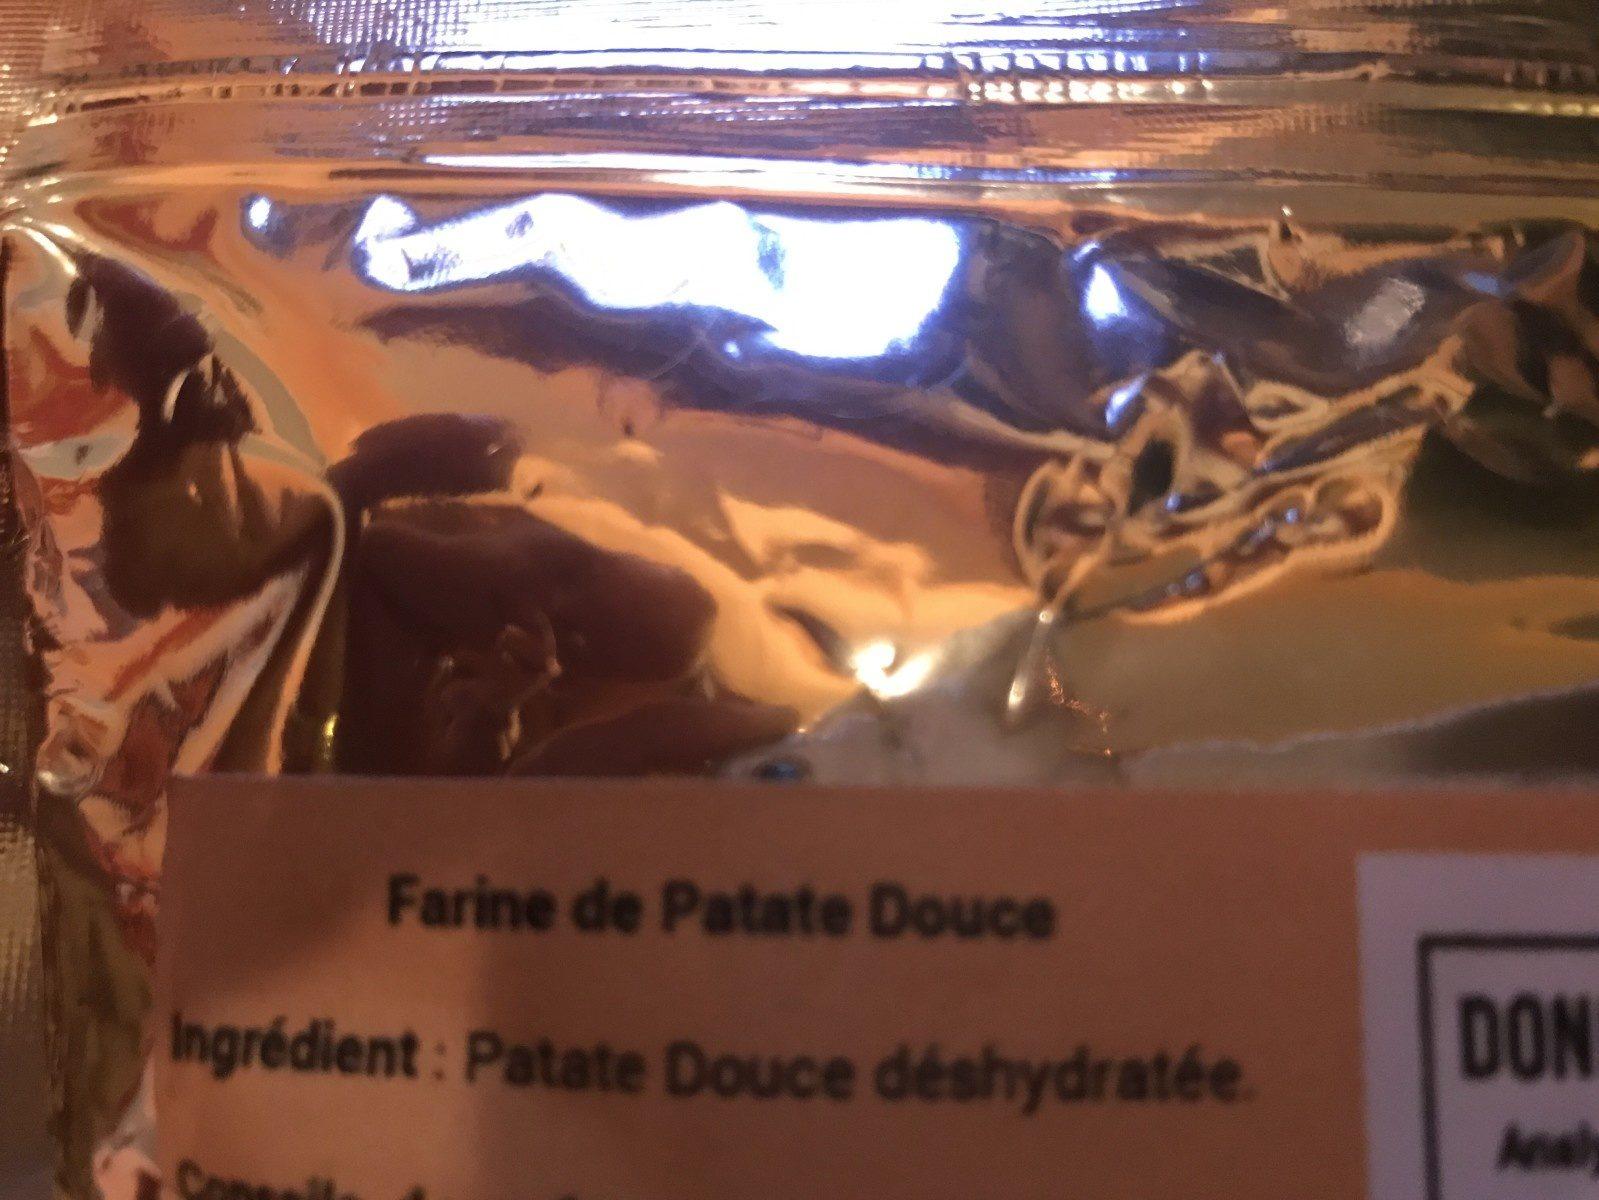 Farine de patate douce - Ingrediënten